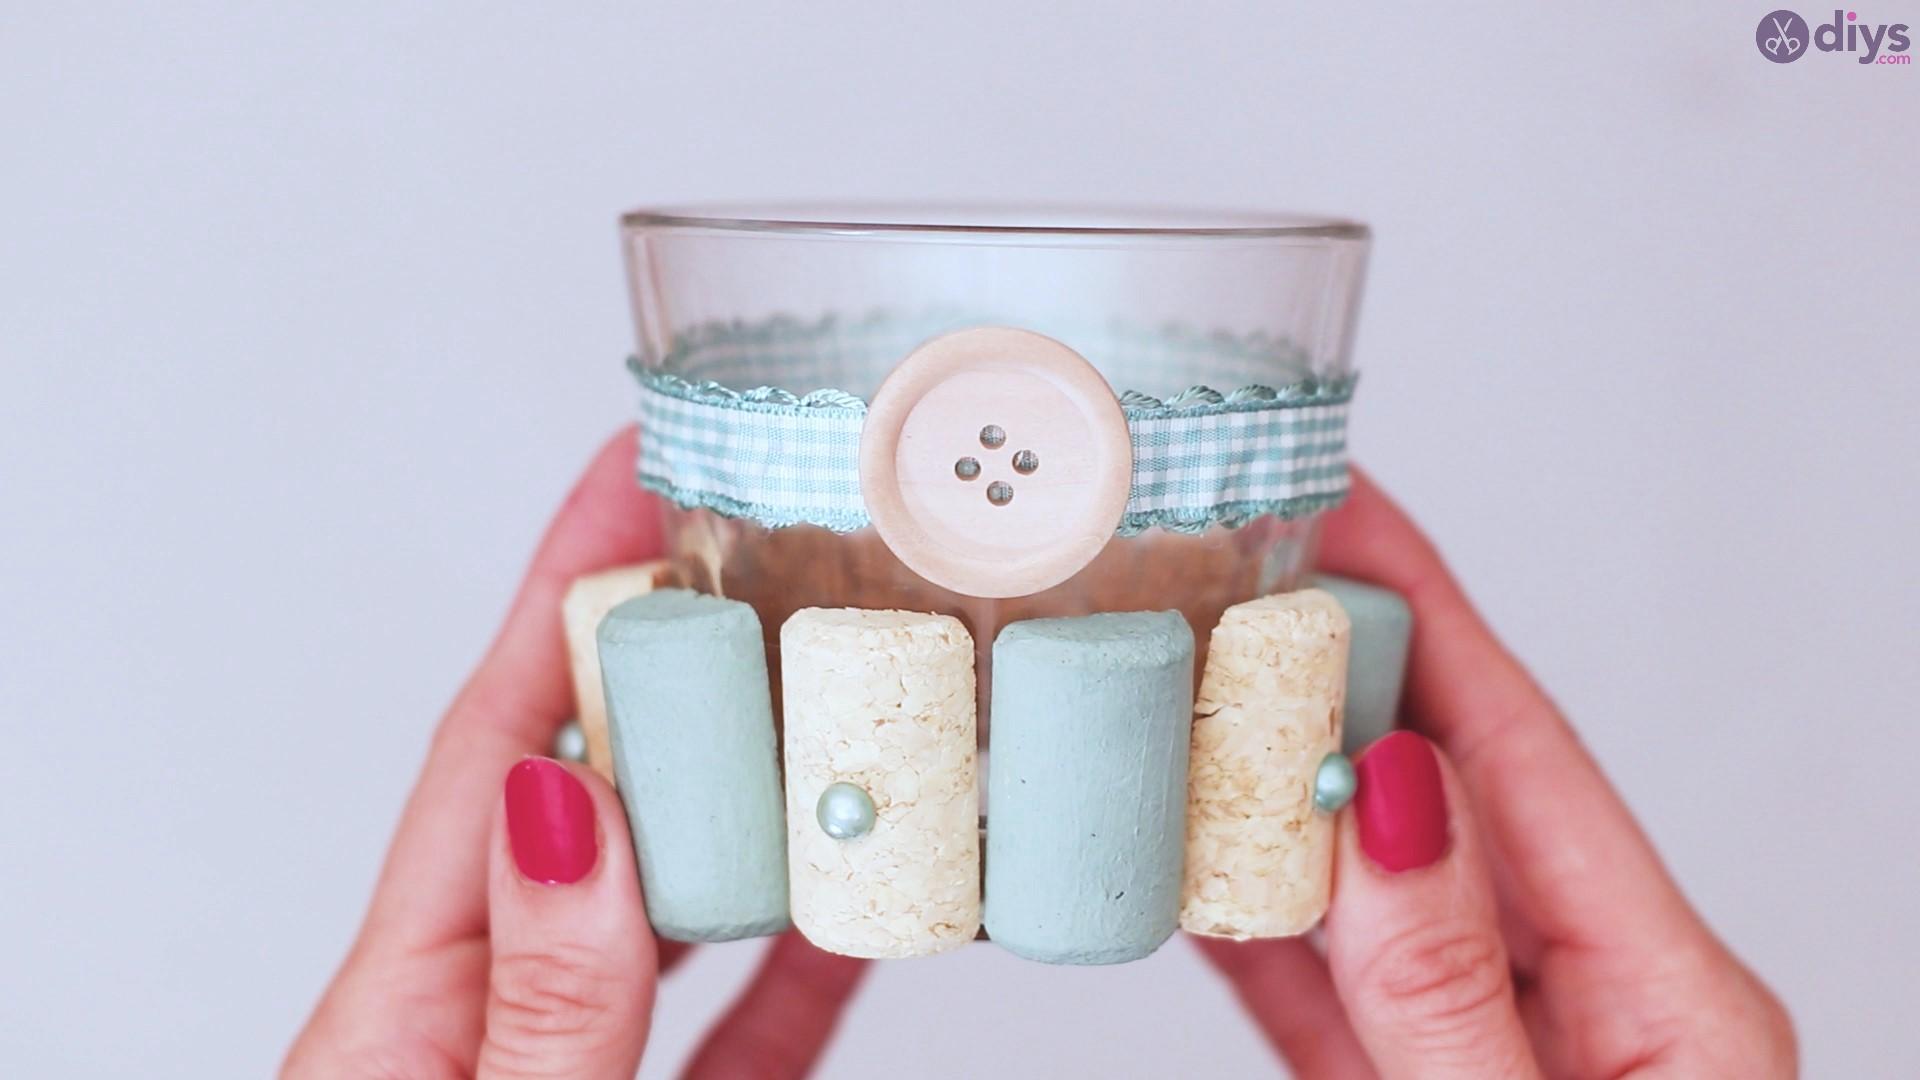 Diy wine cork candle holder (31)